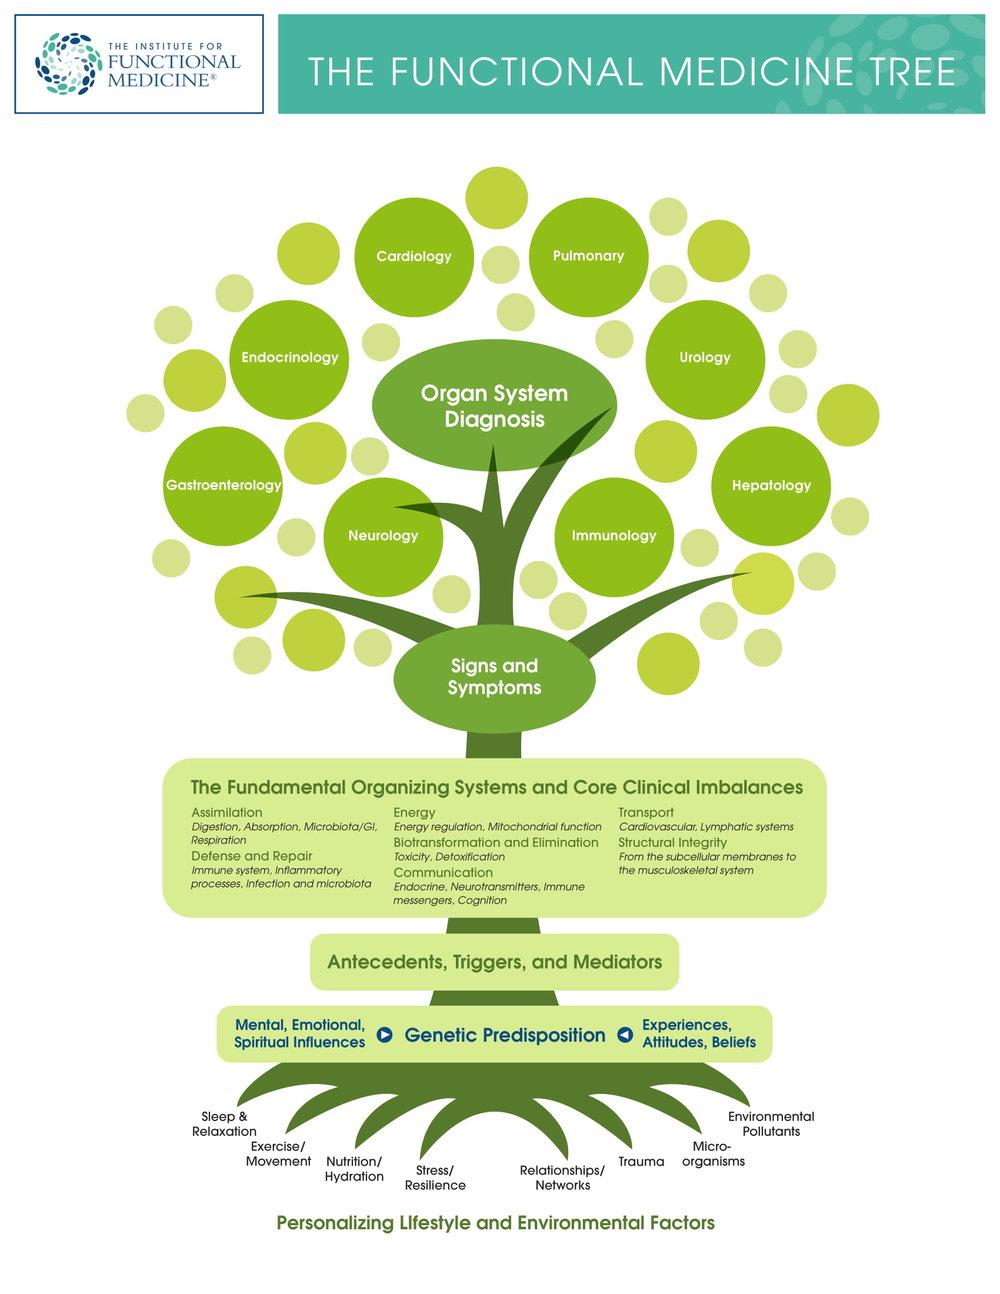 IFM tree.jpg